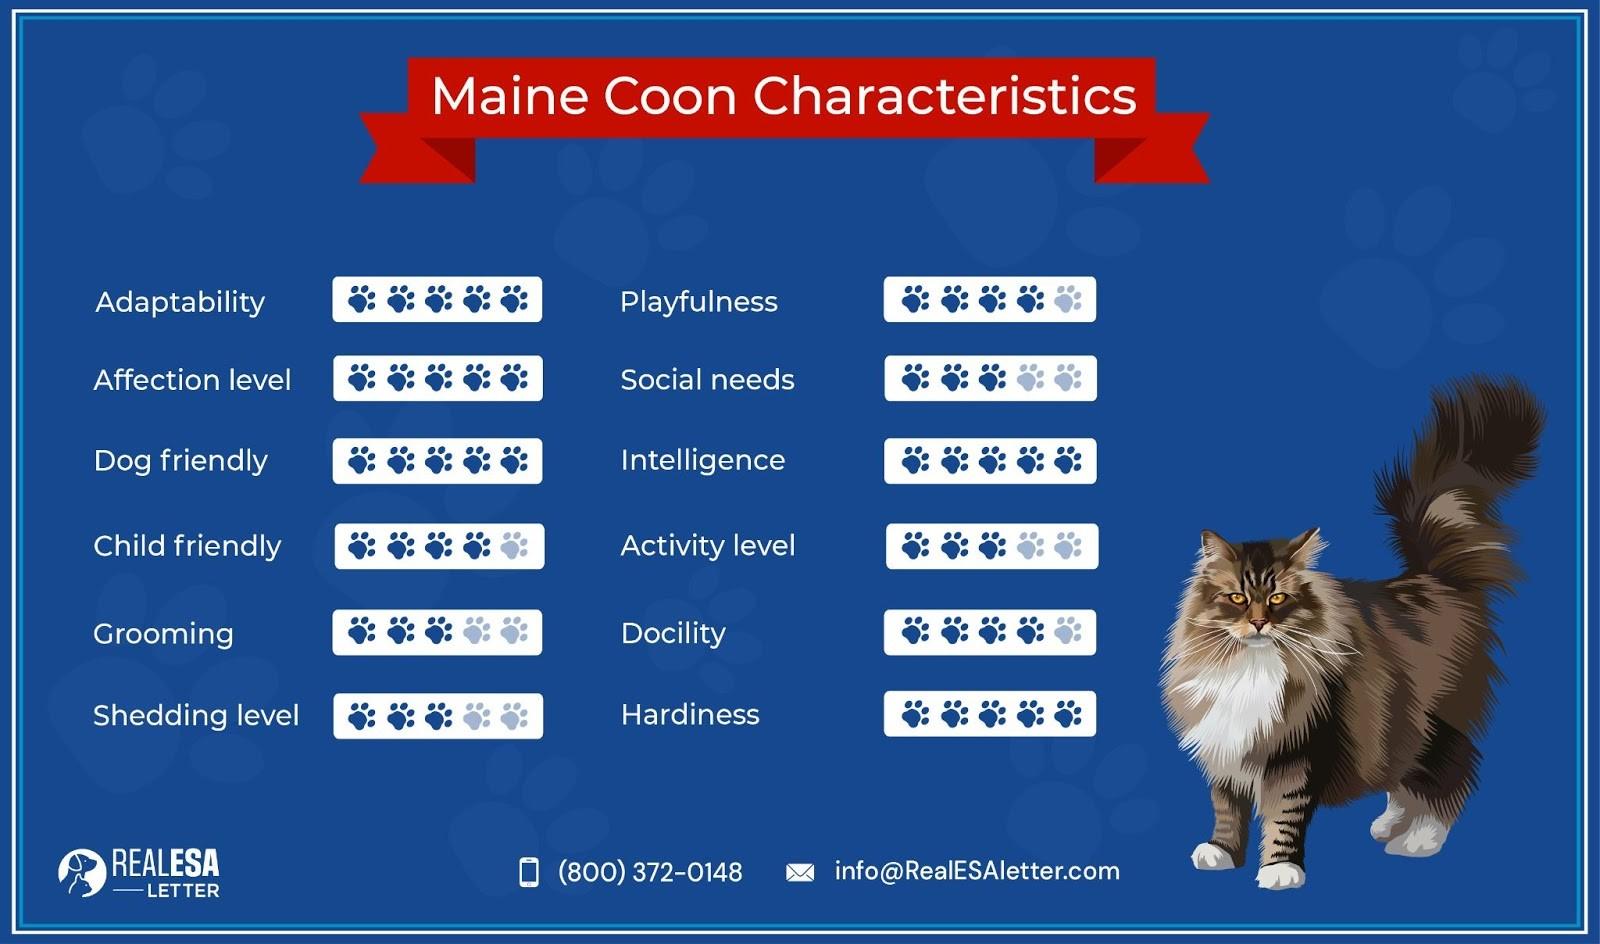 Maine Coon Characteristics